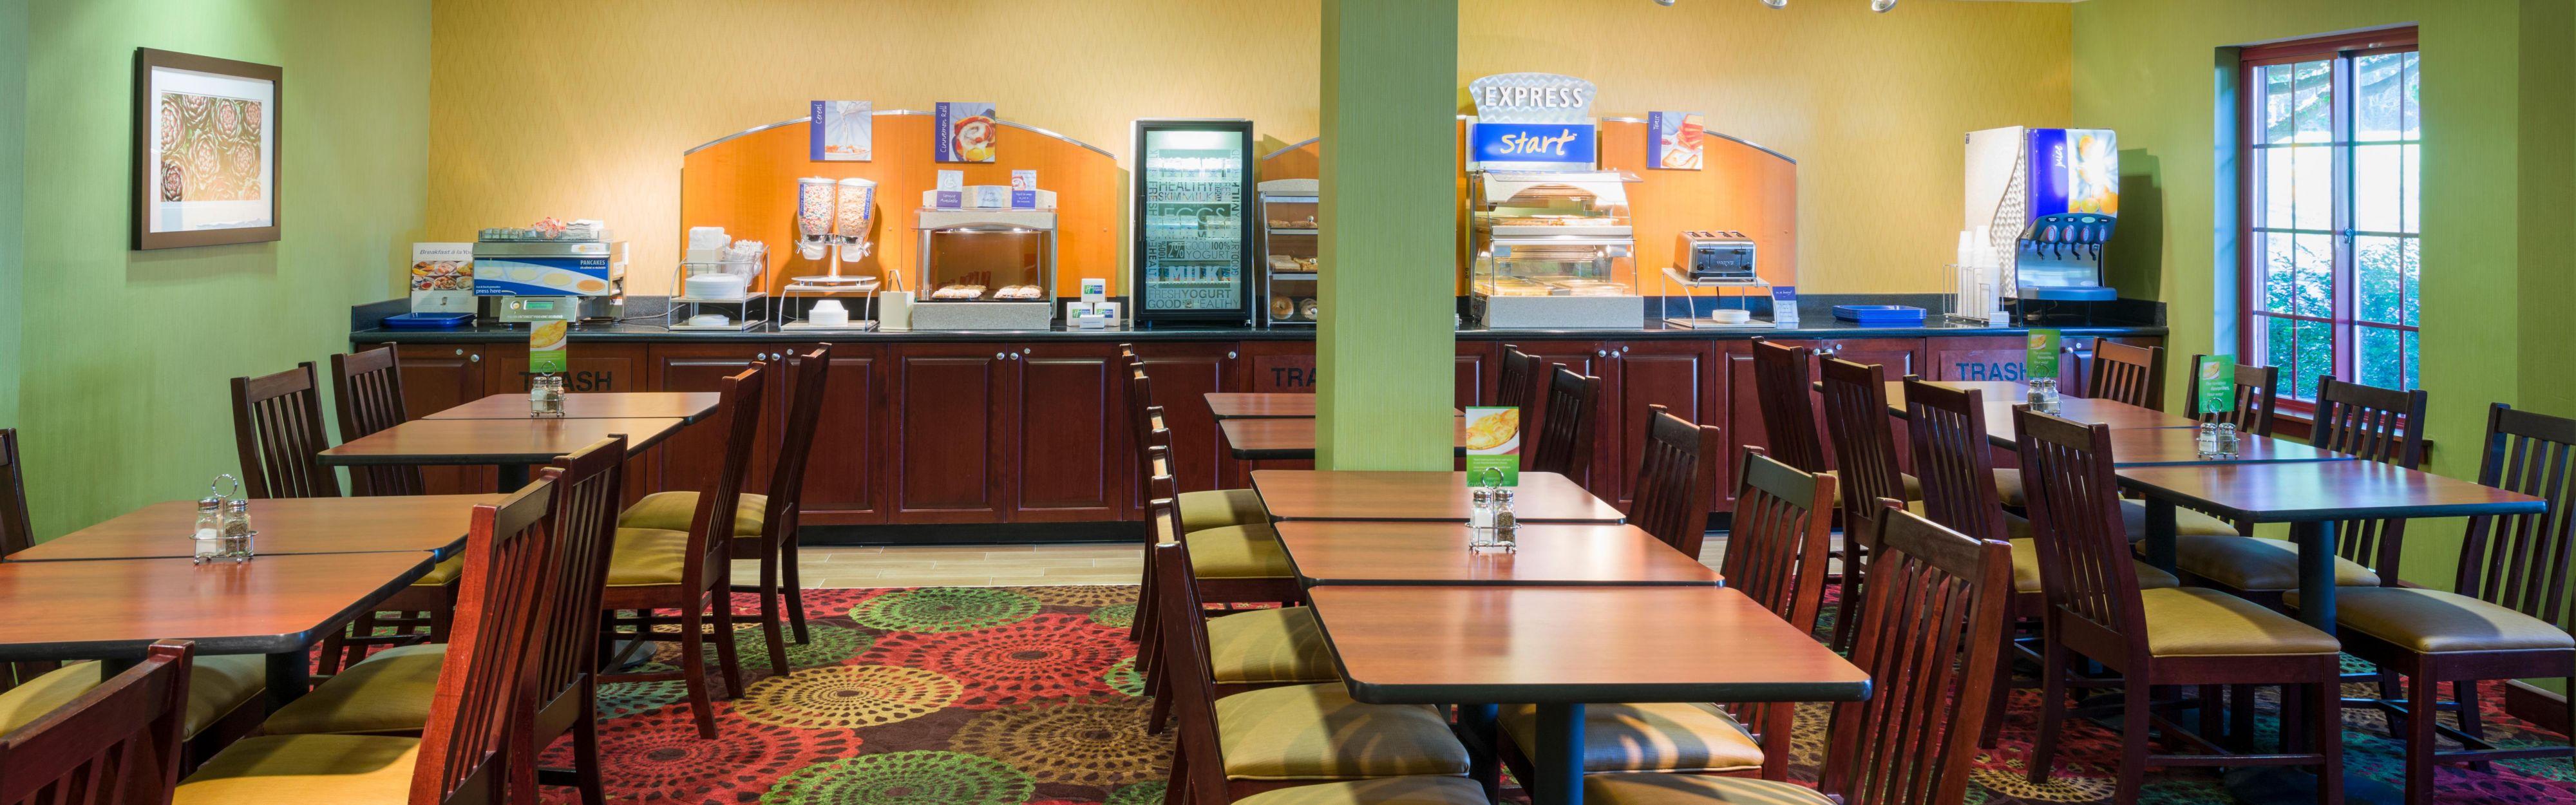 Holiday Inn Express Frazer-Malvern image 3